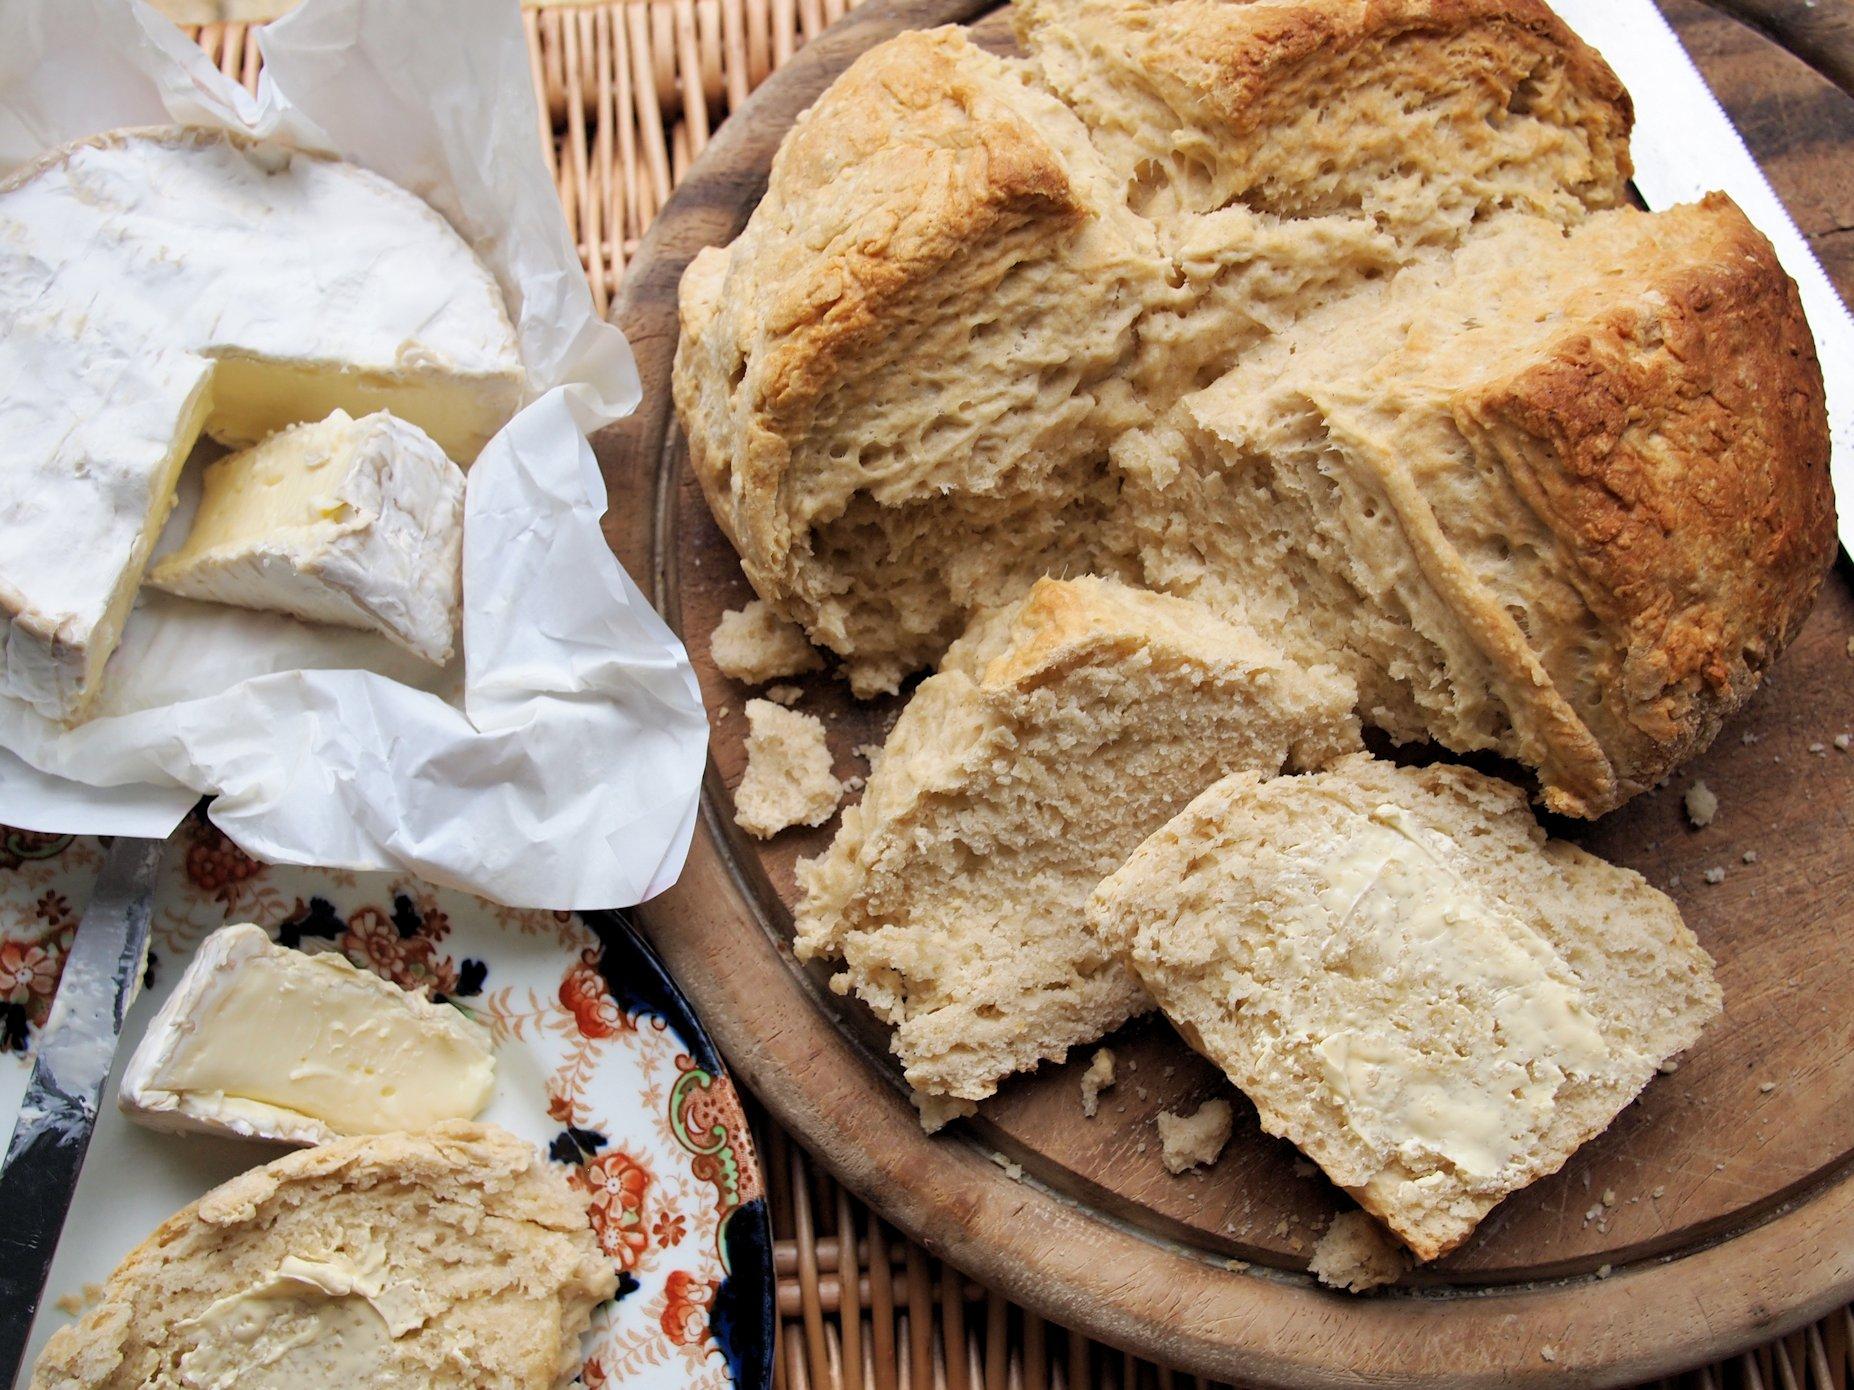 Yeast Dough Patties - Favorite Rural Delicacy 88